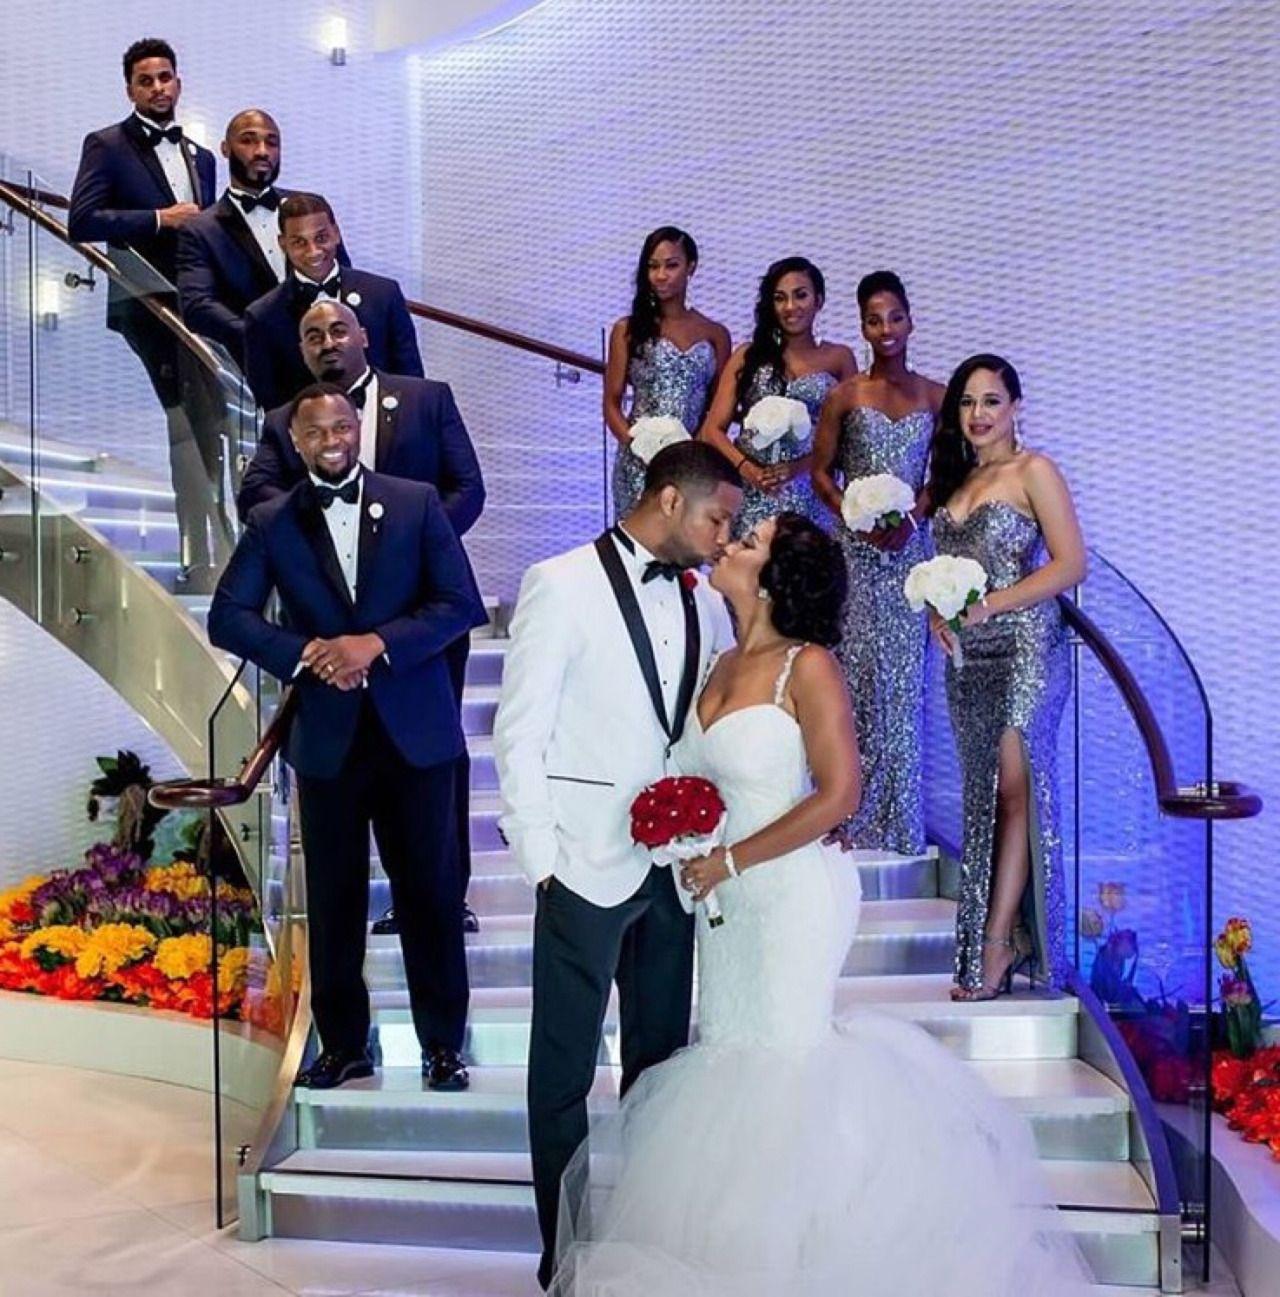 Loveblackcouples Groomsmen Wedding Photos Mermaid Wedding Dress Wedding Poses